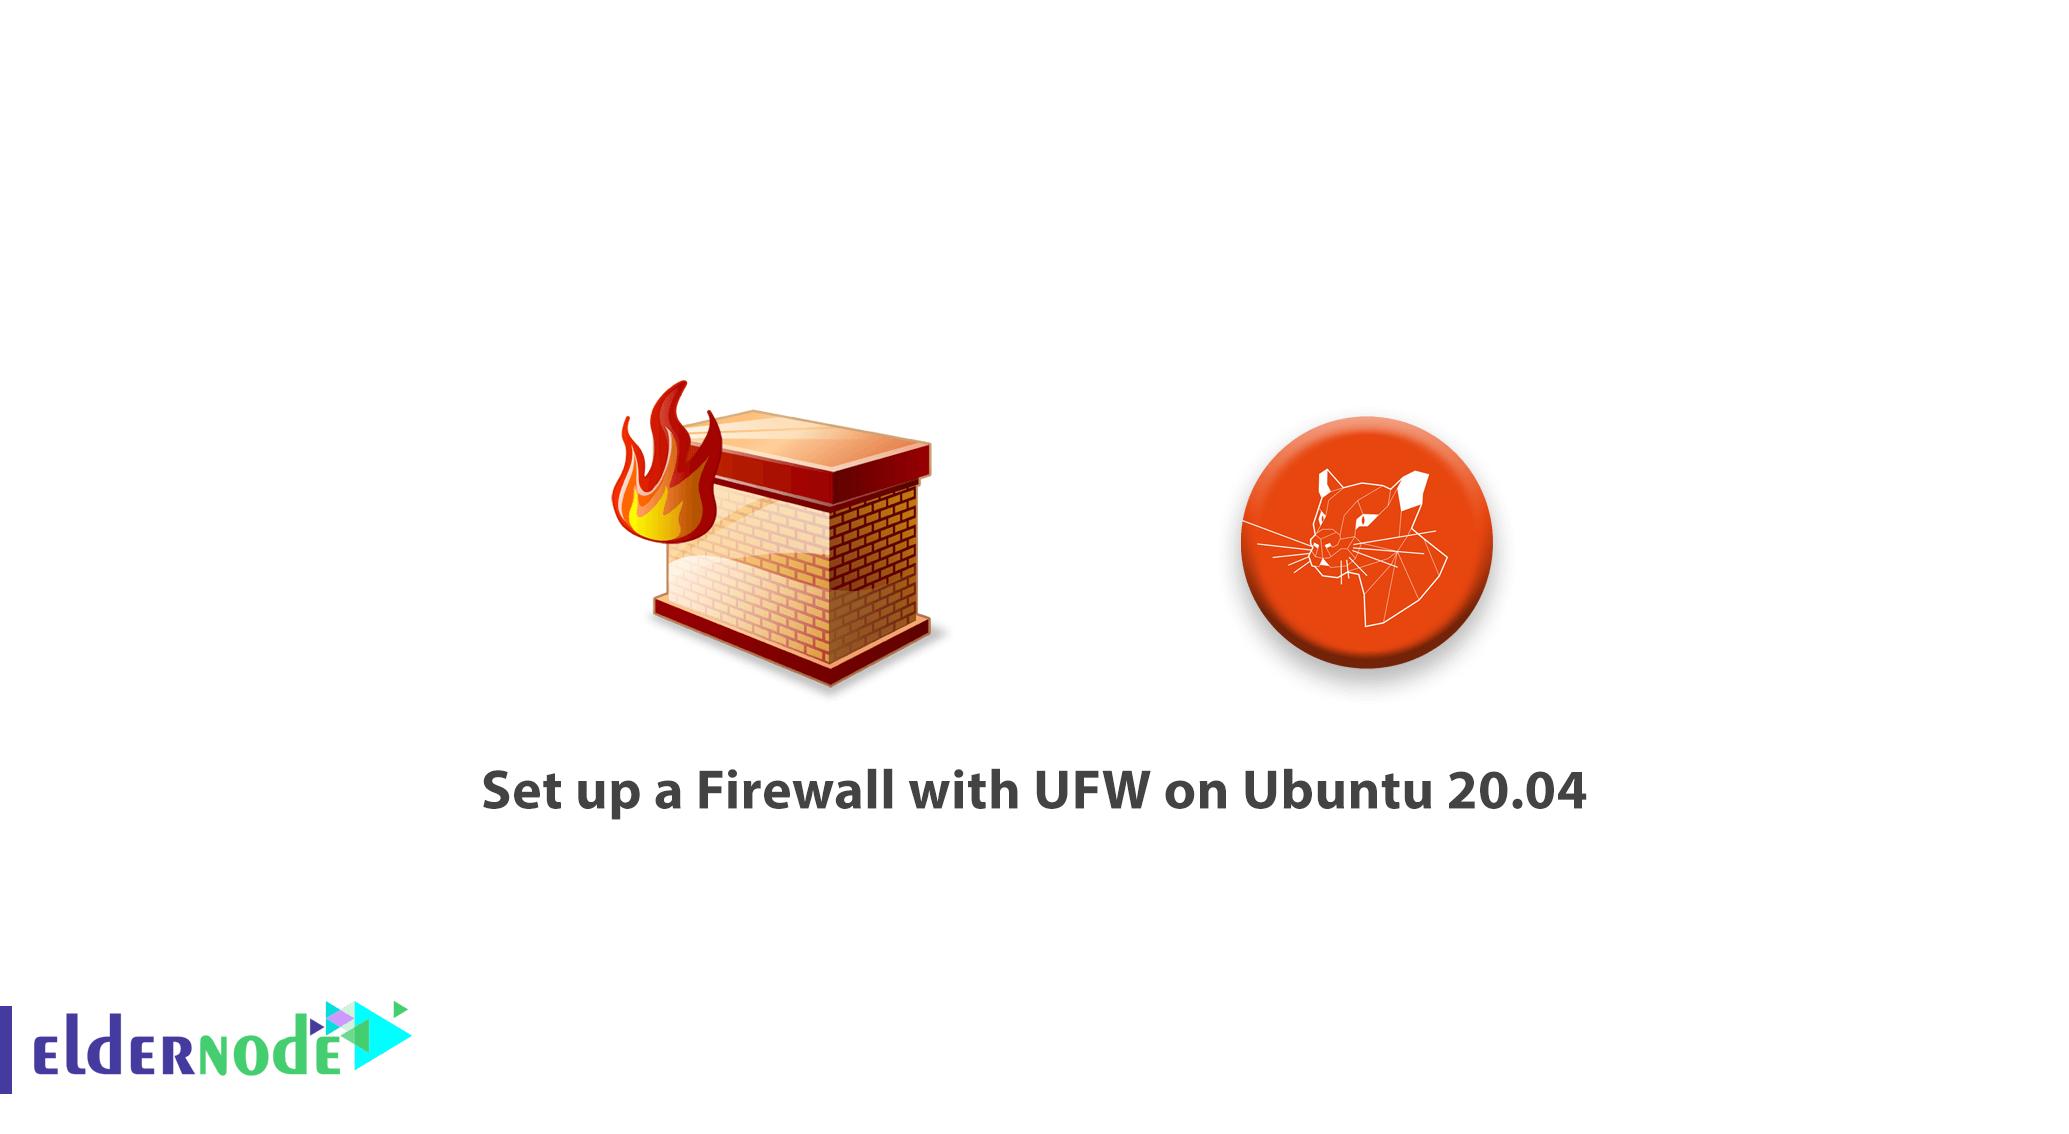 Tutorial set up a Firewall with UFW on Ubuntu 20.04